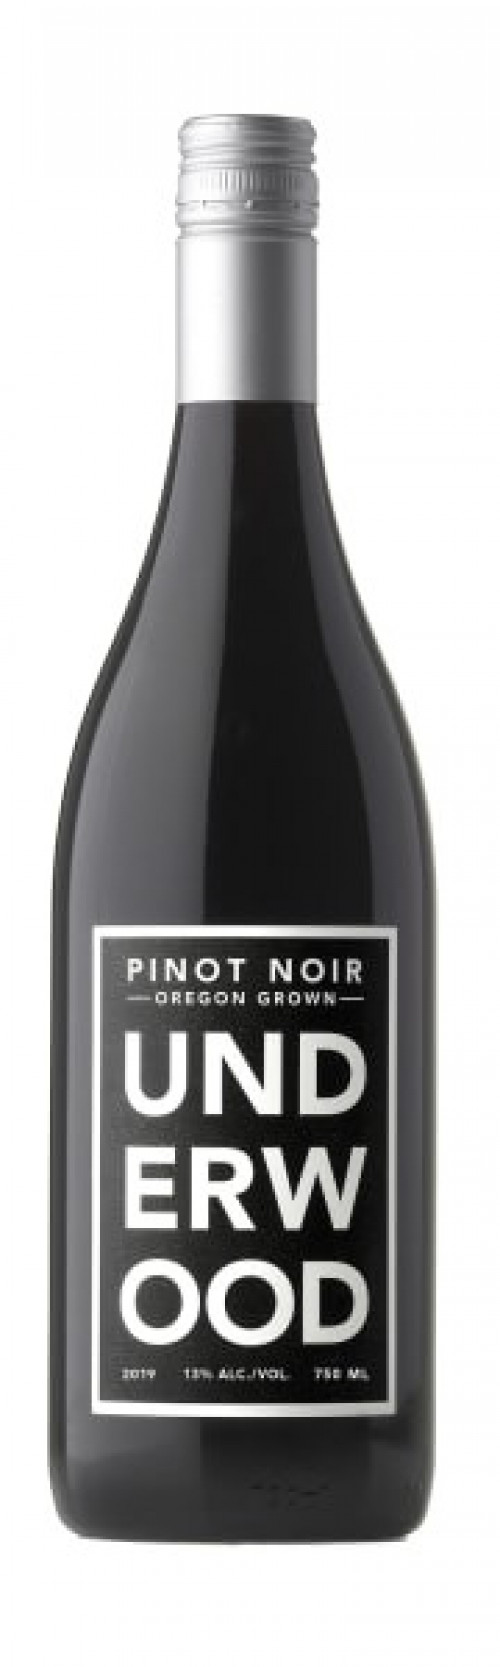 2019 Underwood Pinot Noir 750ml